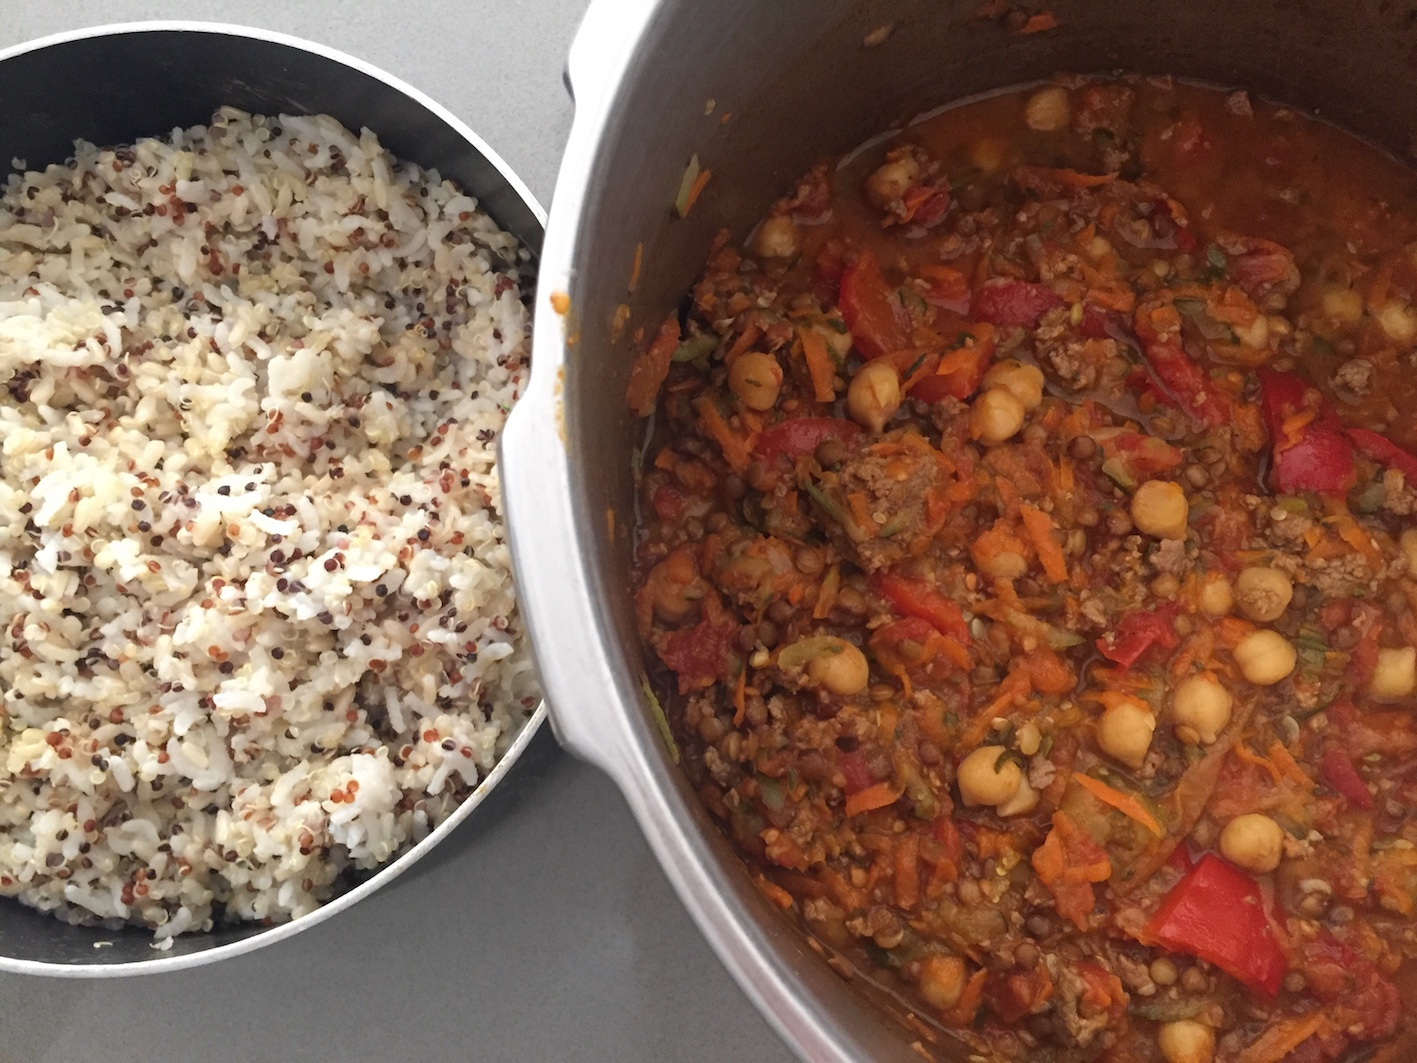 chili-con-carne-rice.jpg